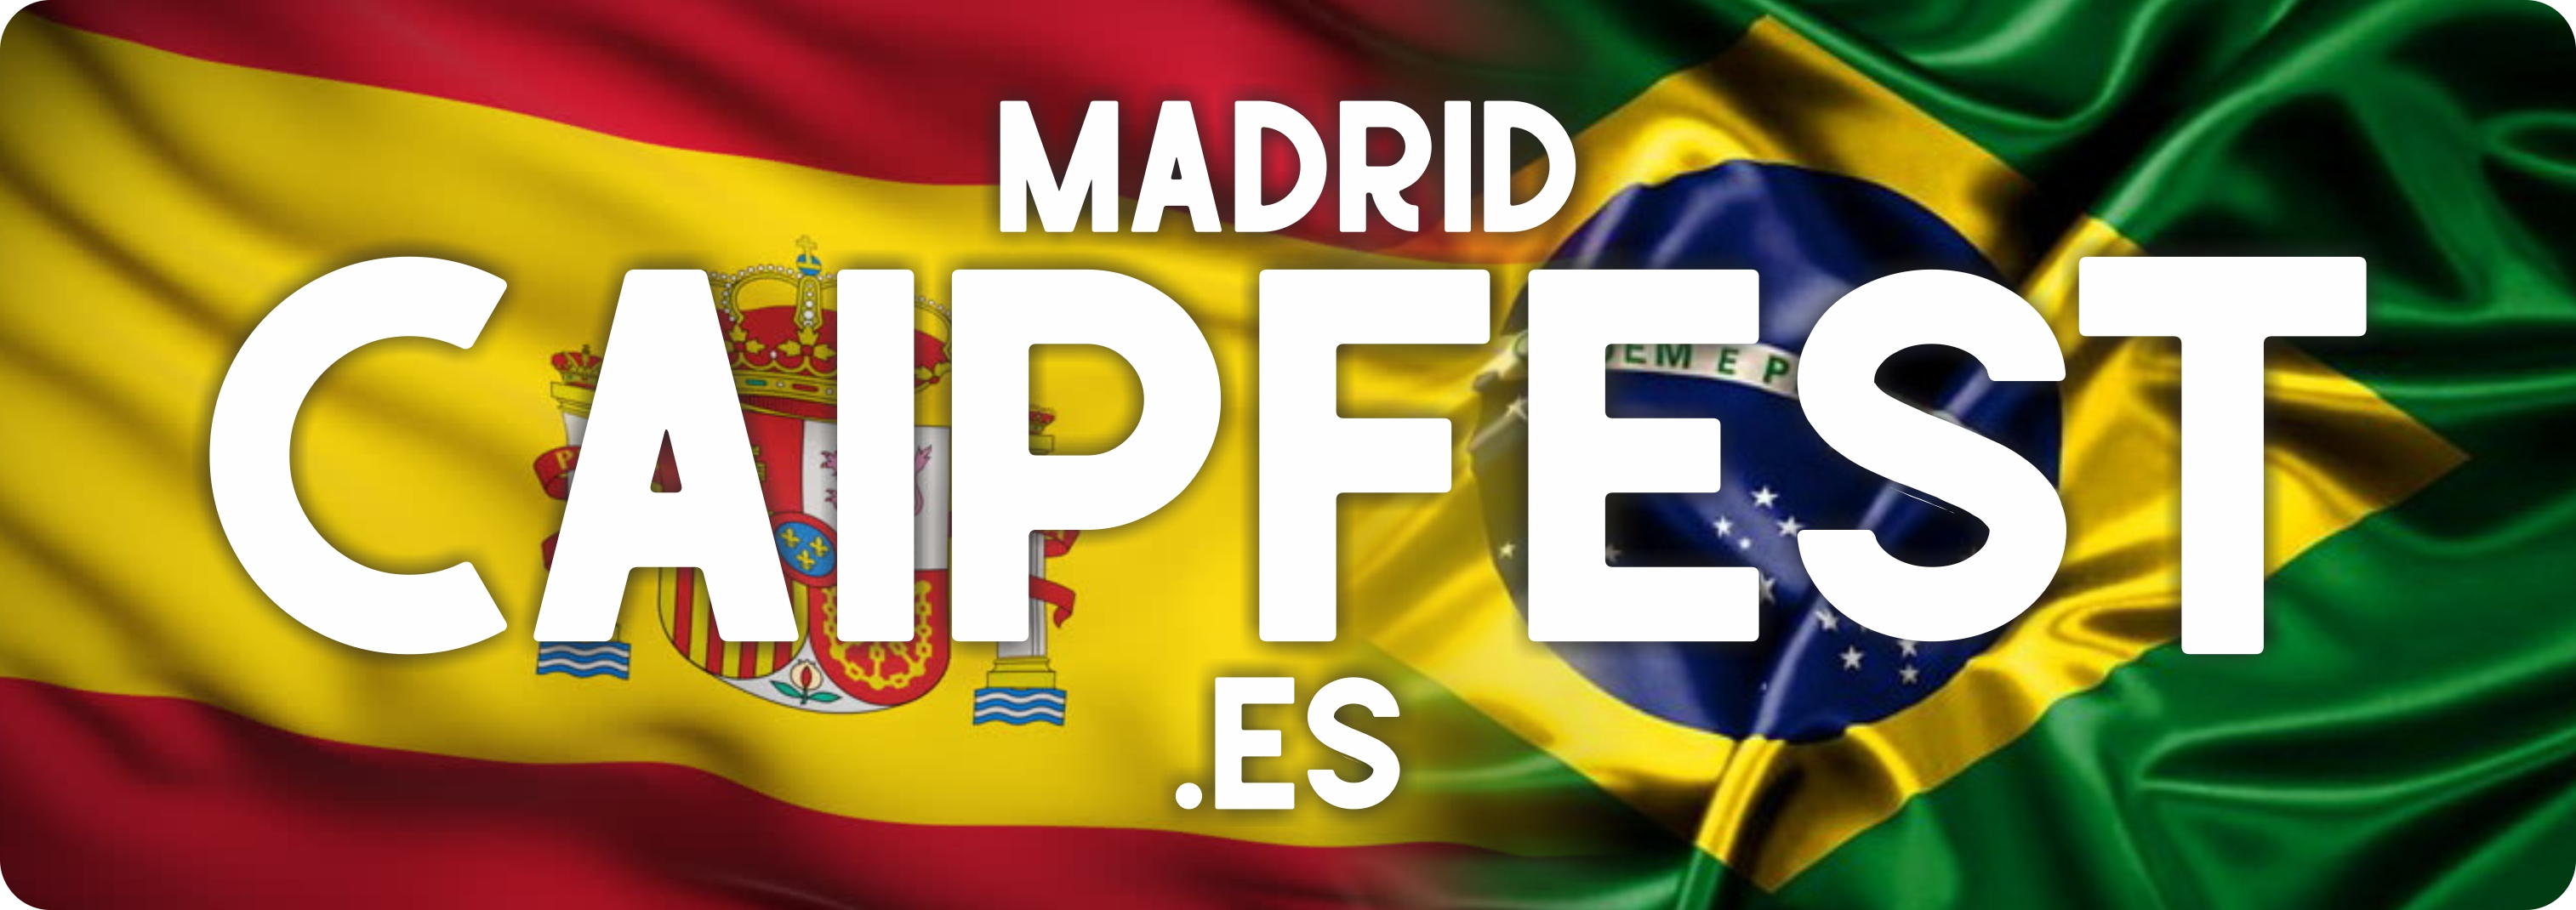 SPAIN EVENT BUTTON